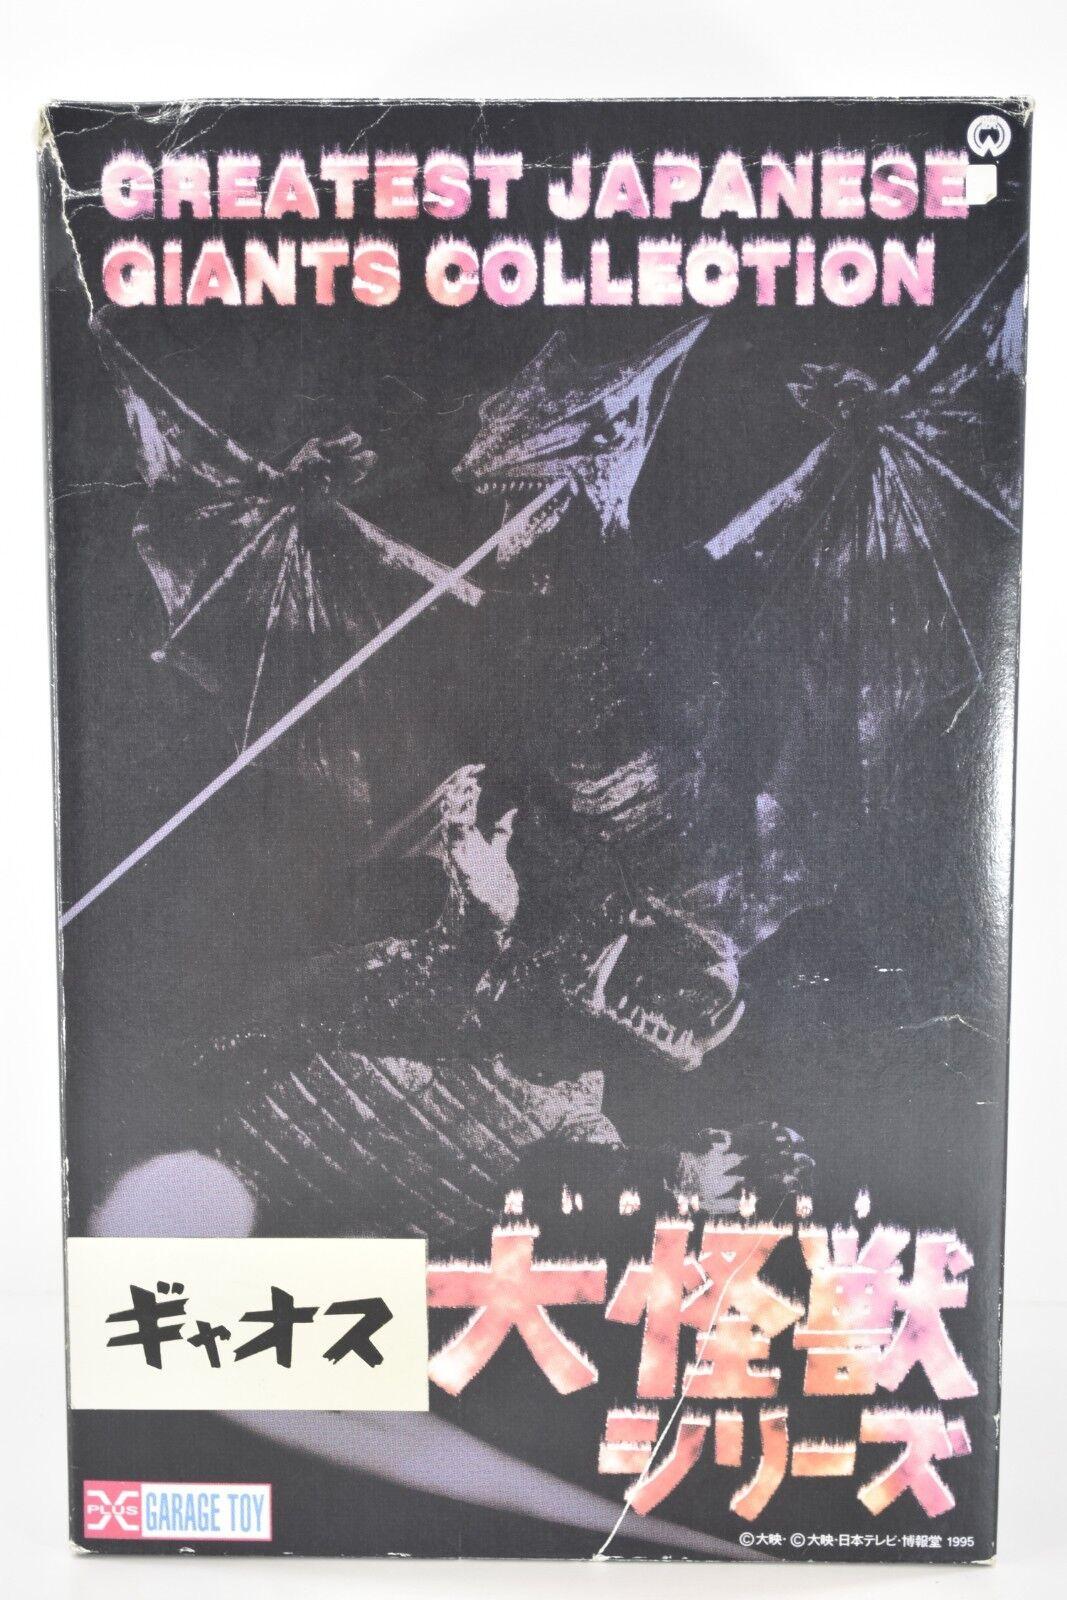 X-plus gyaos garage spielzeug - 8.abbildung harz godzilla limited edition japan 1995